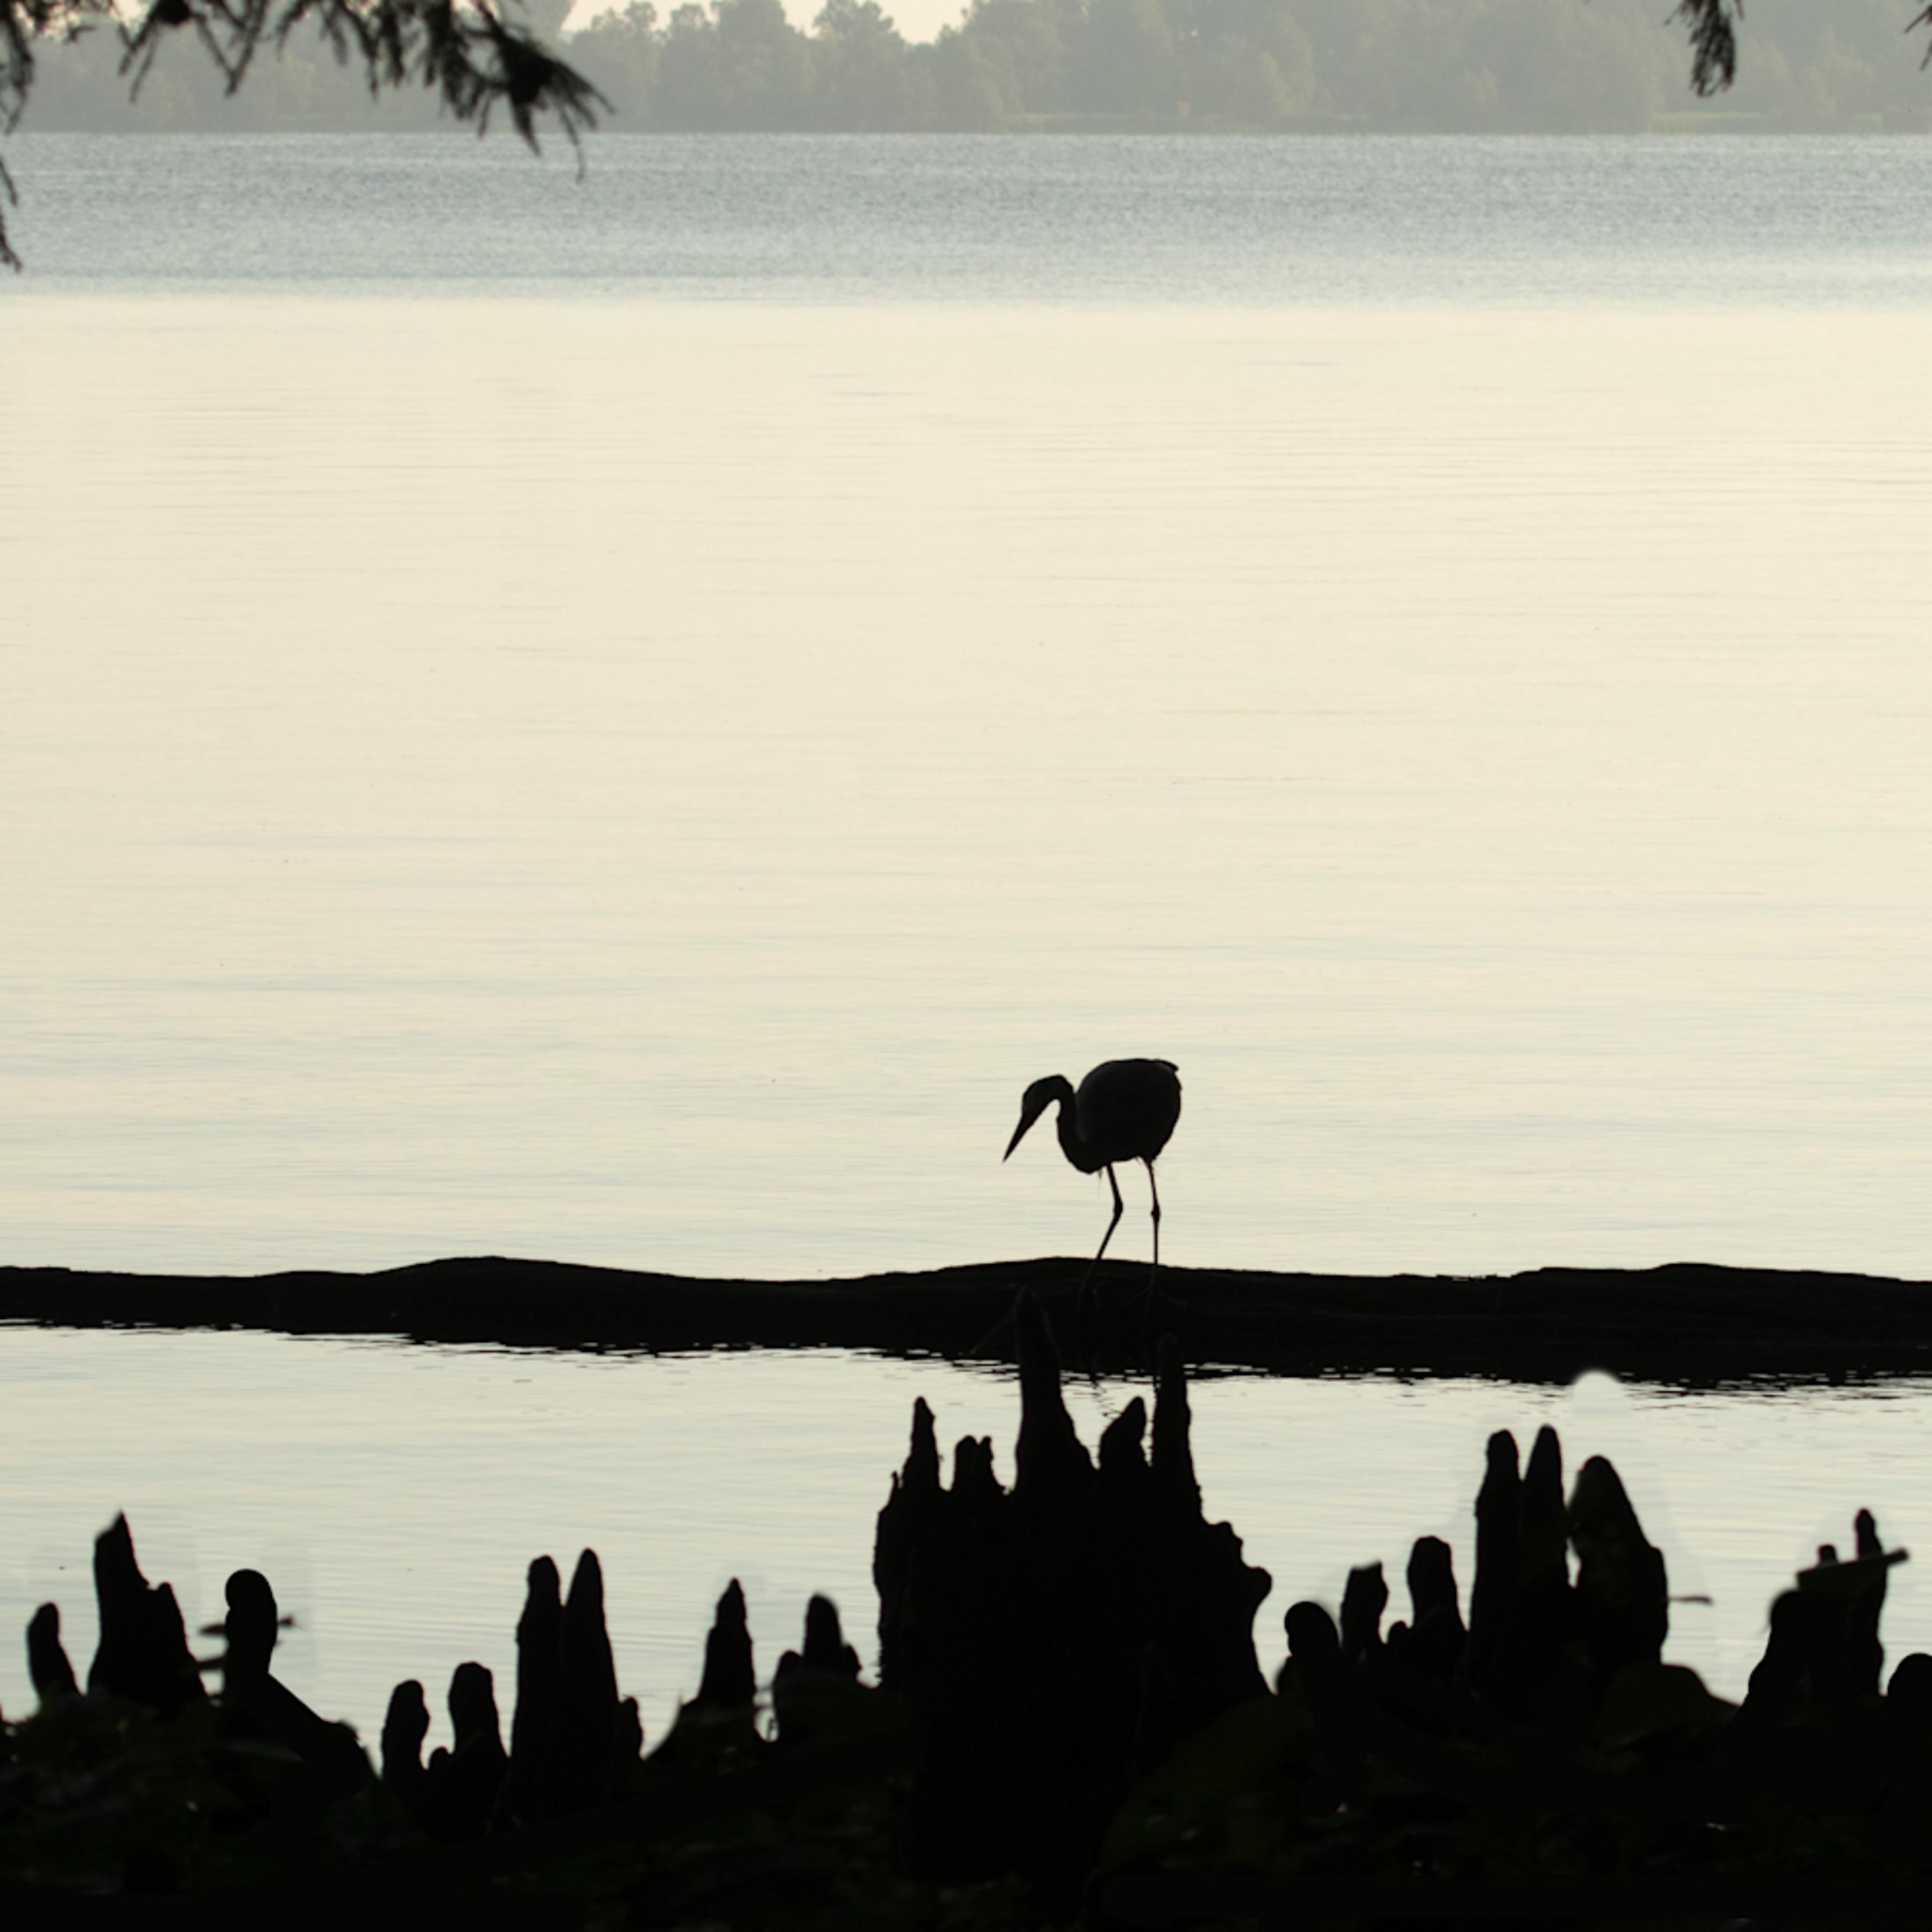 Heron silhouettes mg 7511 srm20 qxiod9